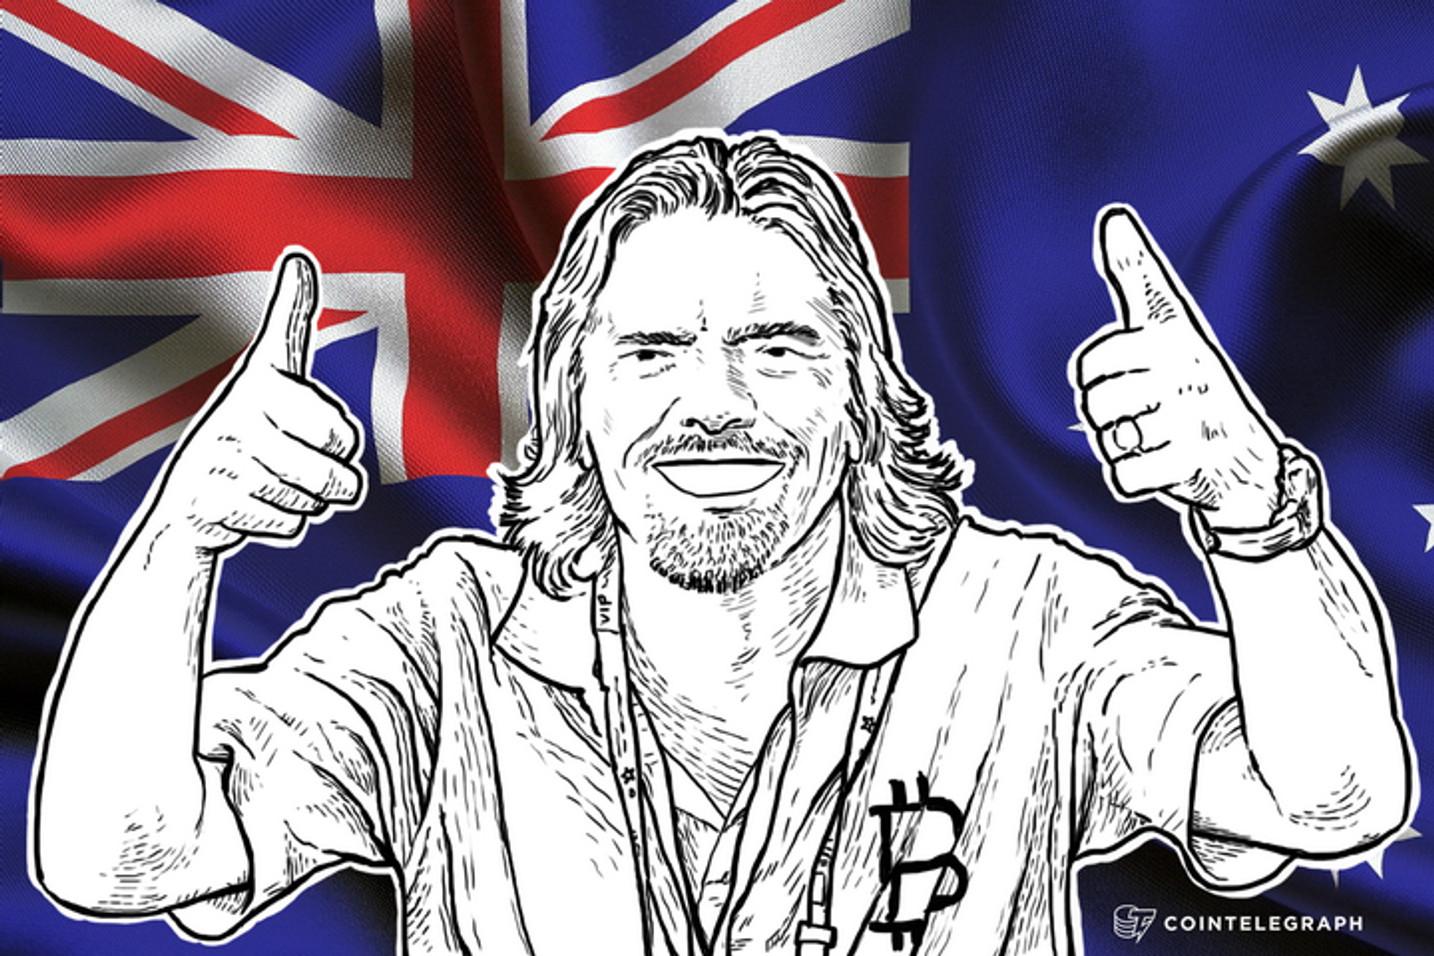 Sir Richard Branson Endorses the Australian Digital Currency Commerce Association